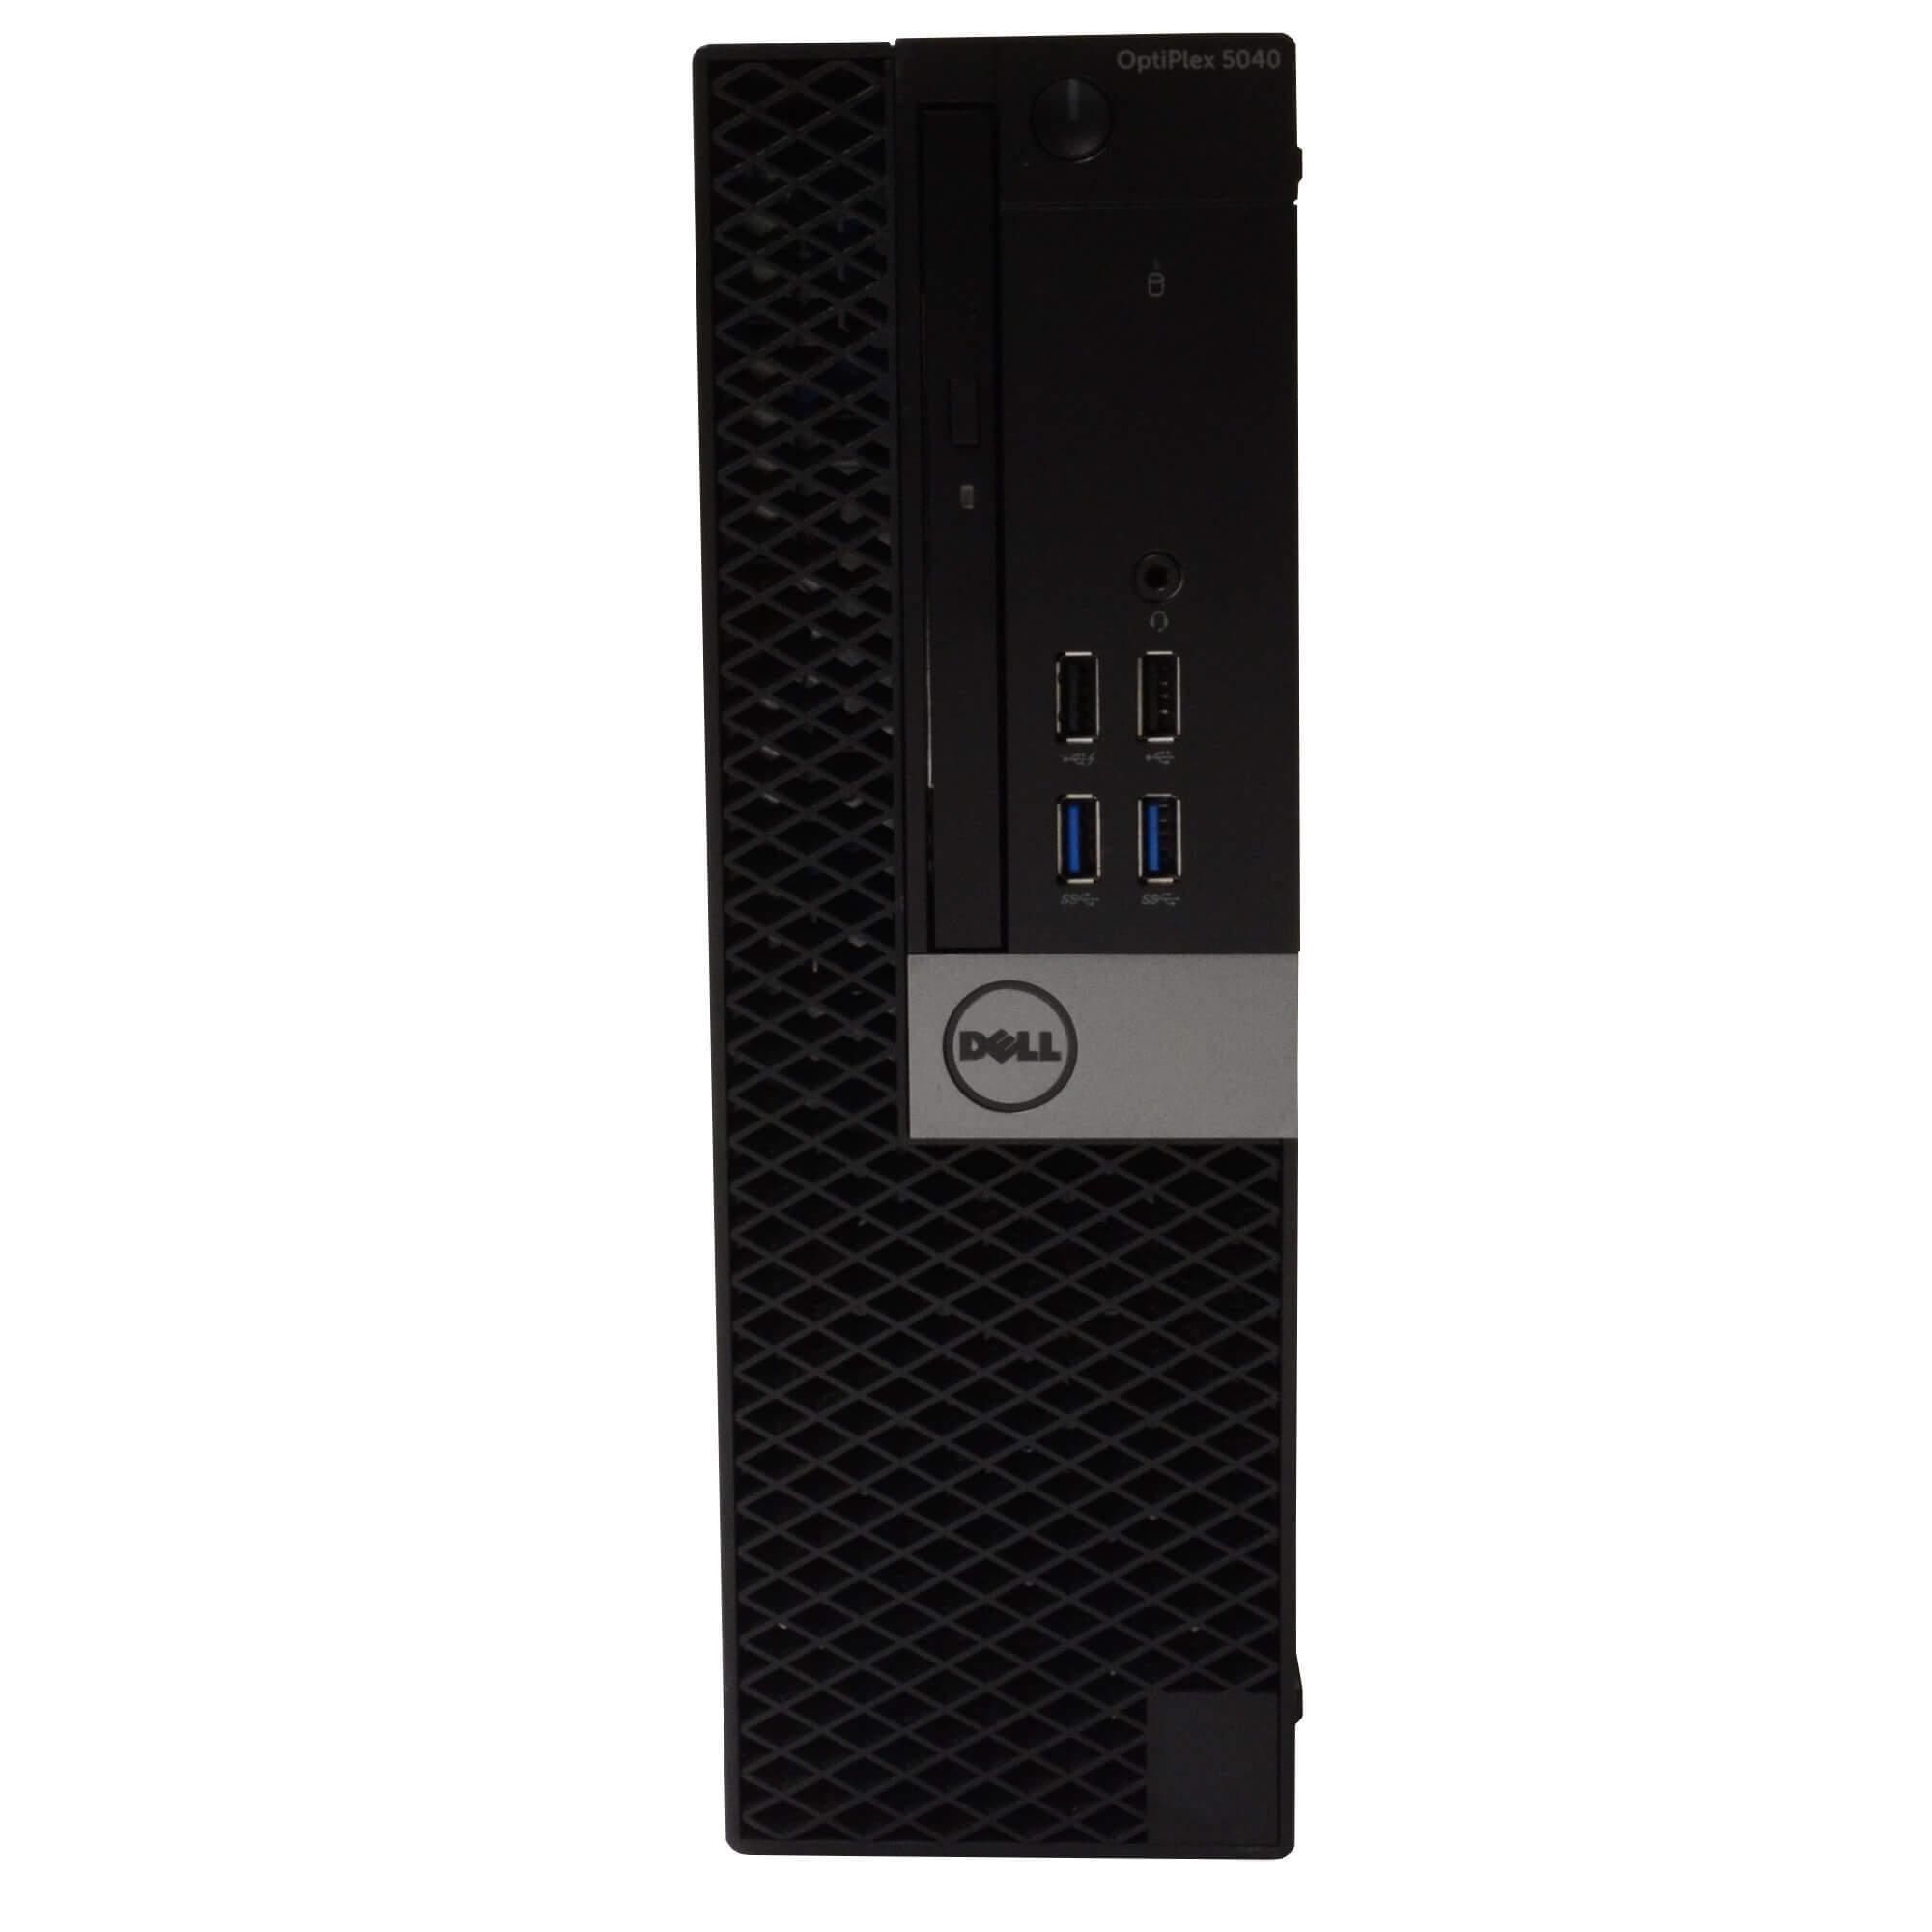 Dell OptiPlex 5040 SFF Core i7 3.4 GHz - SSD 512 GB RAM 16GB